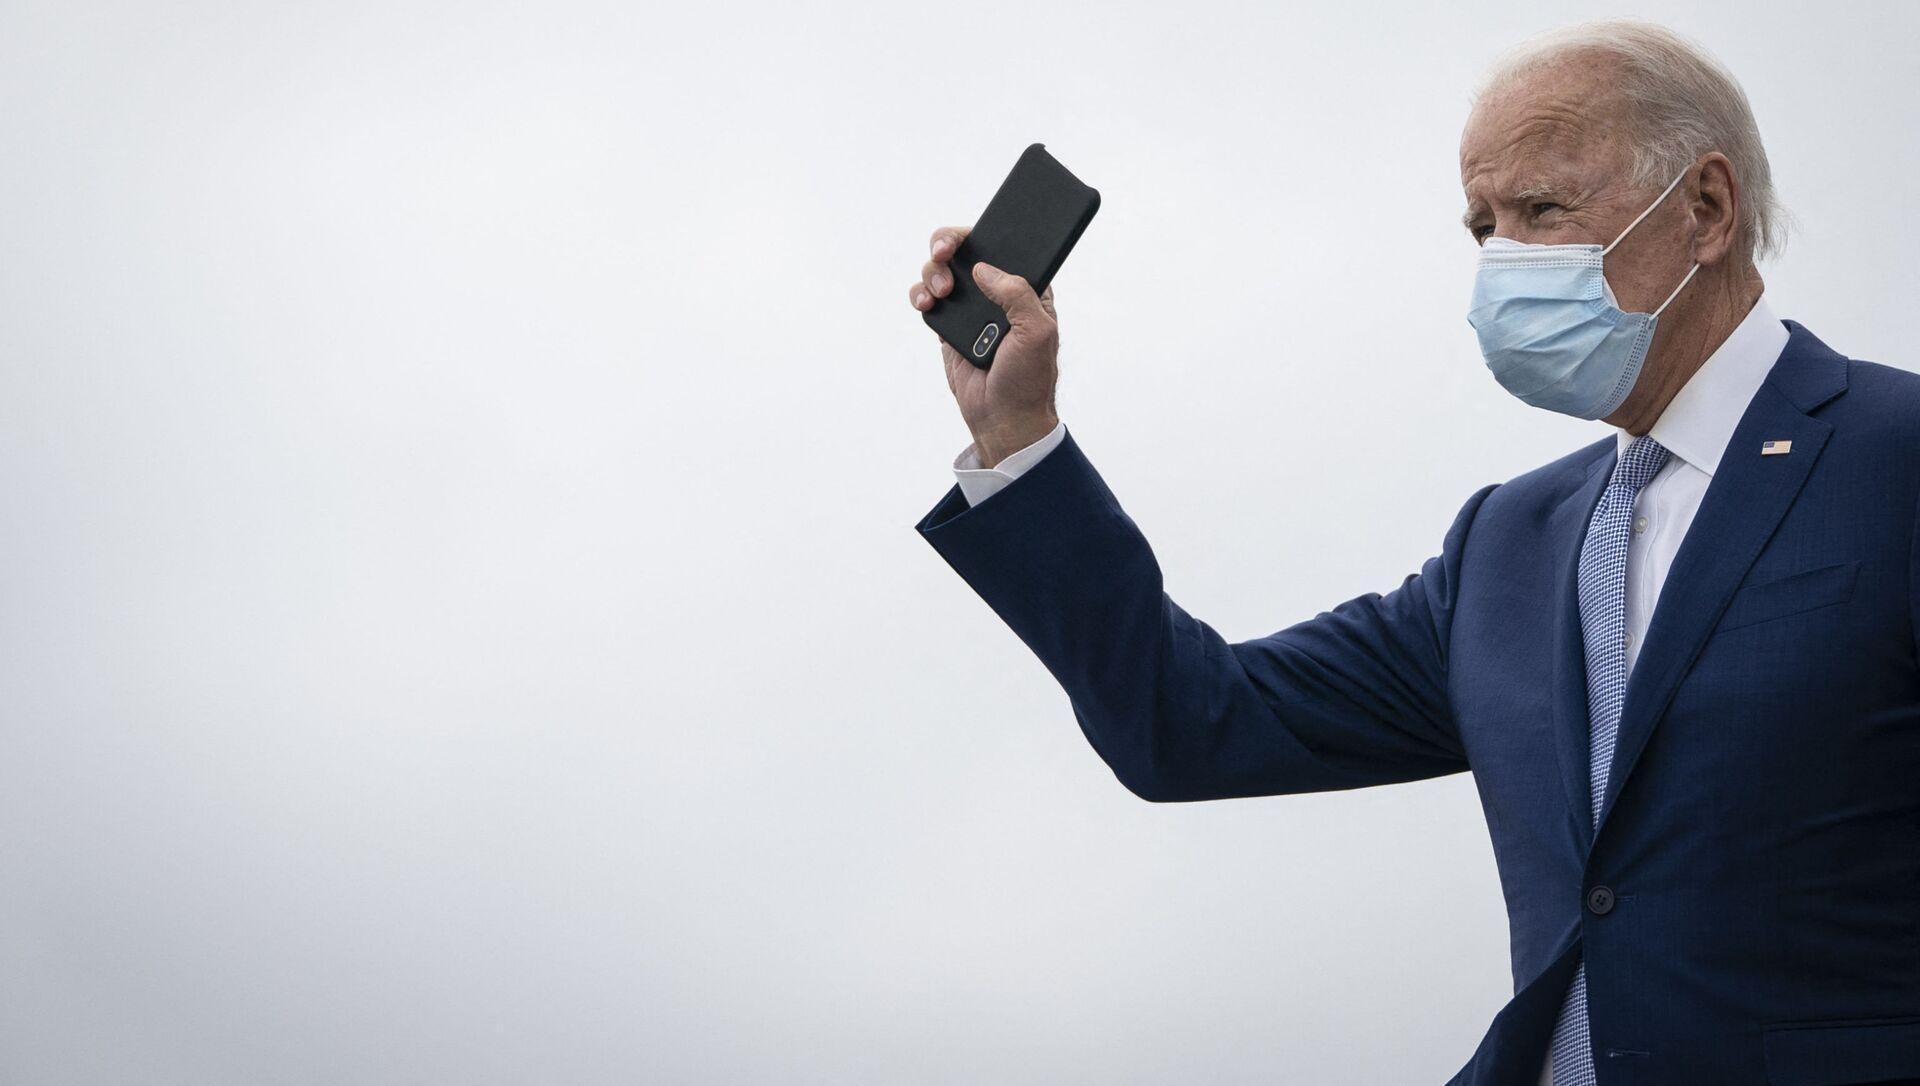 Joe Biden z telefonem w dłoni - Sputnik Polska, 1920, 30.05.2021